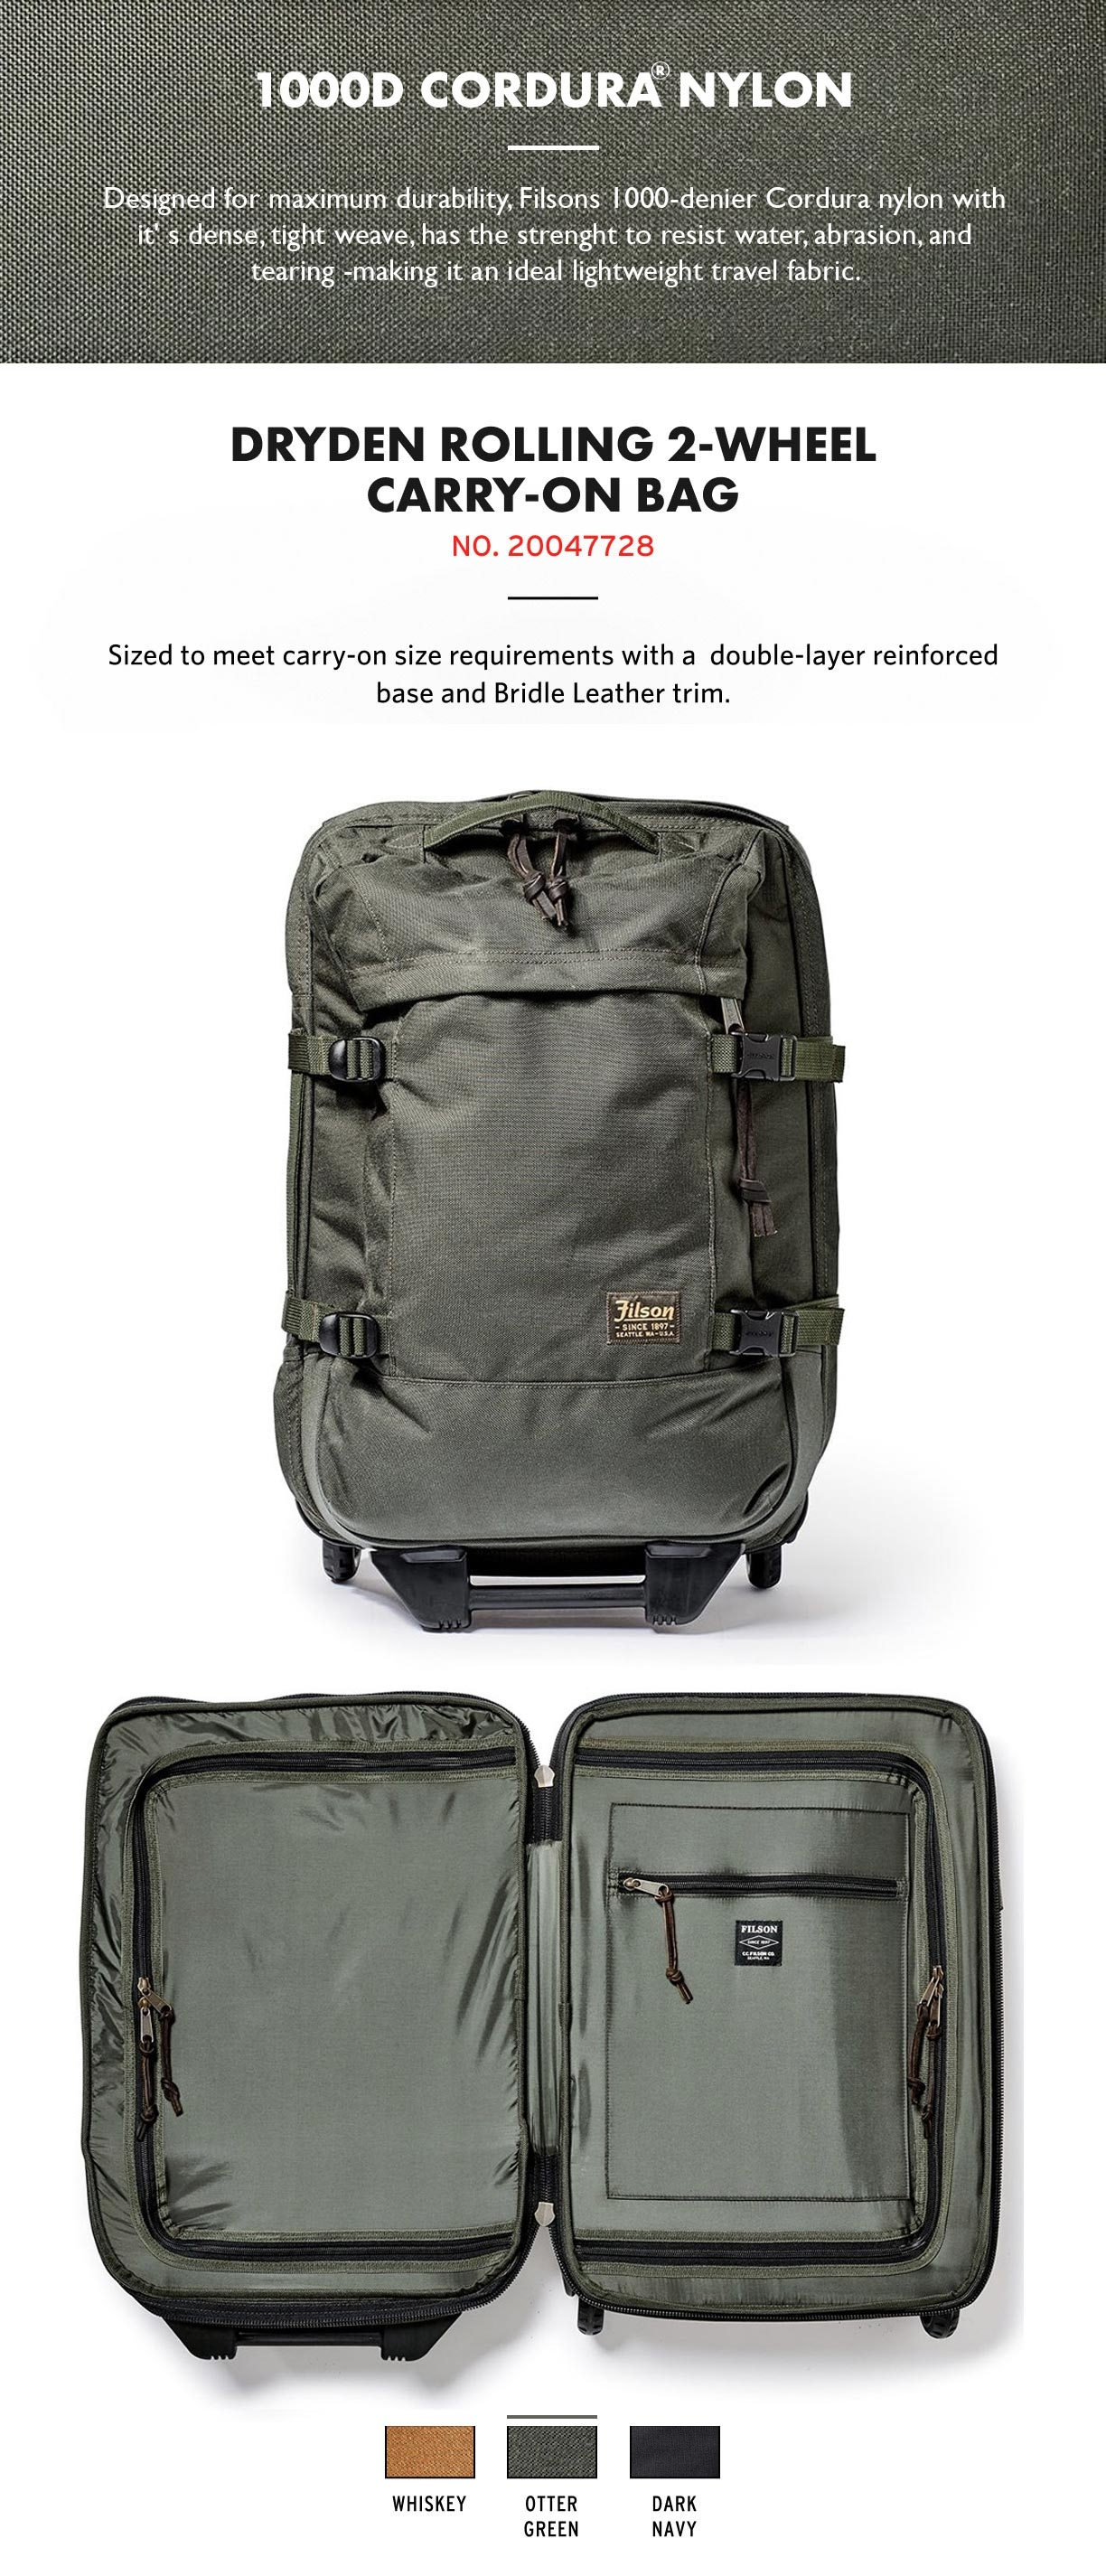 Filson Dryden 2-Wheel Rolling Carry-On Bag Dark Navy Product-information